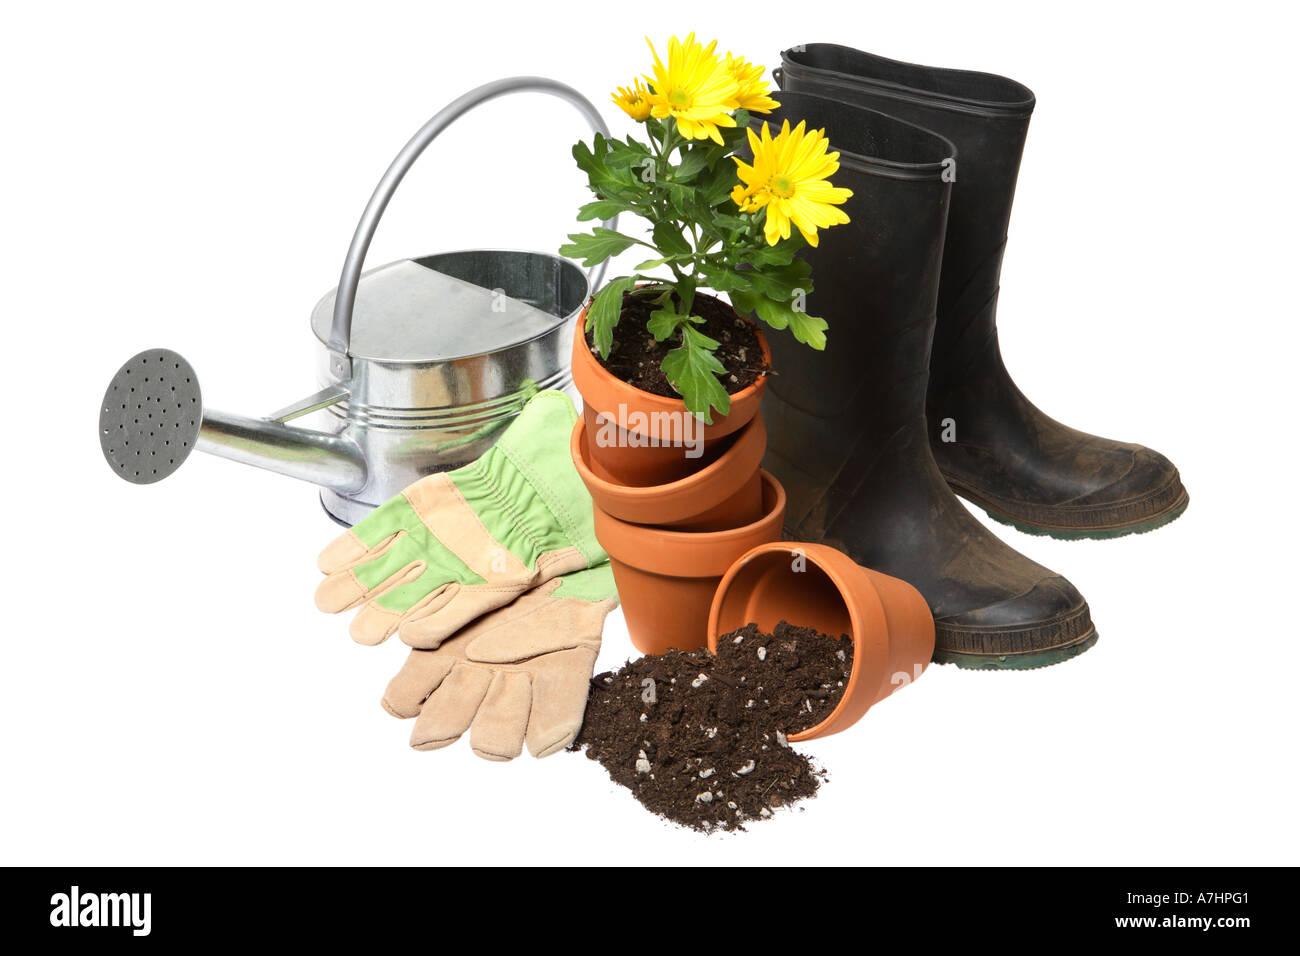 Garten Dinge Gießkanne Garten Handschuhe Terrakotta Töpfe Blumen